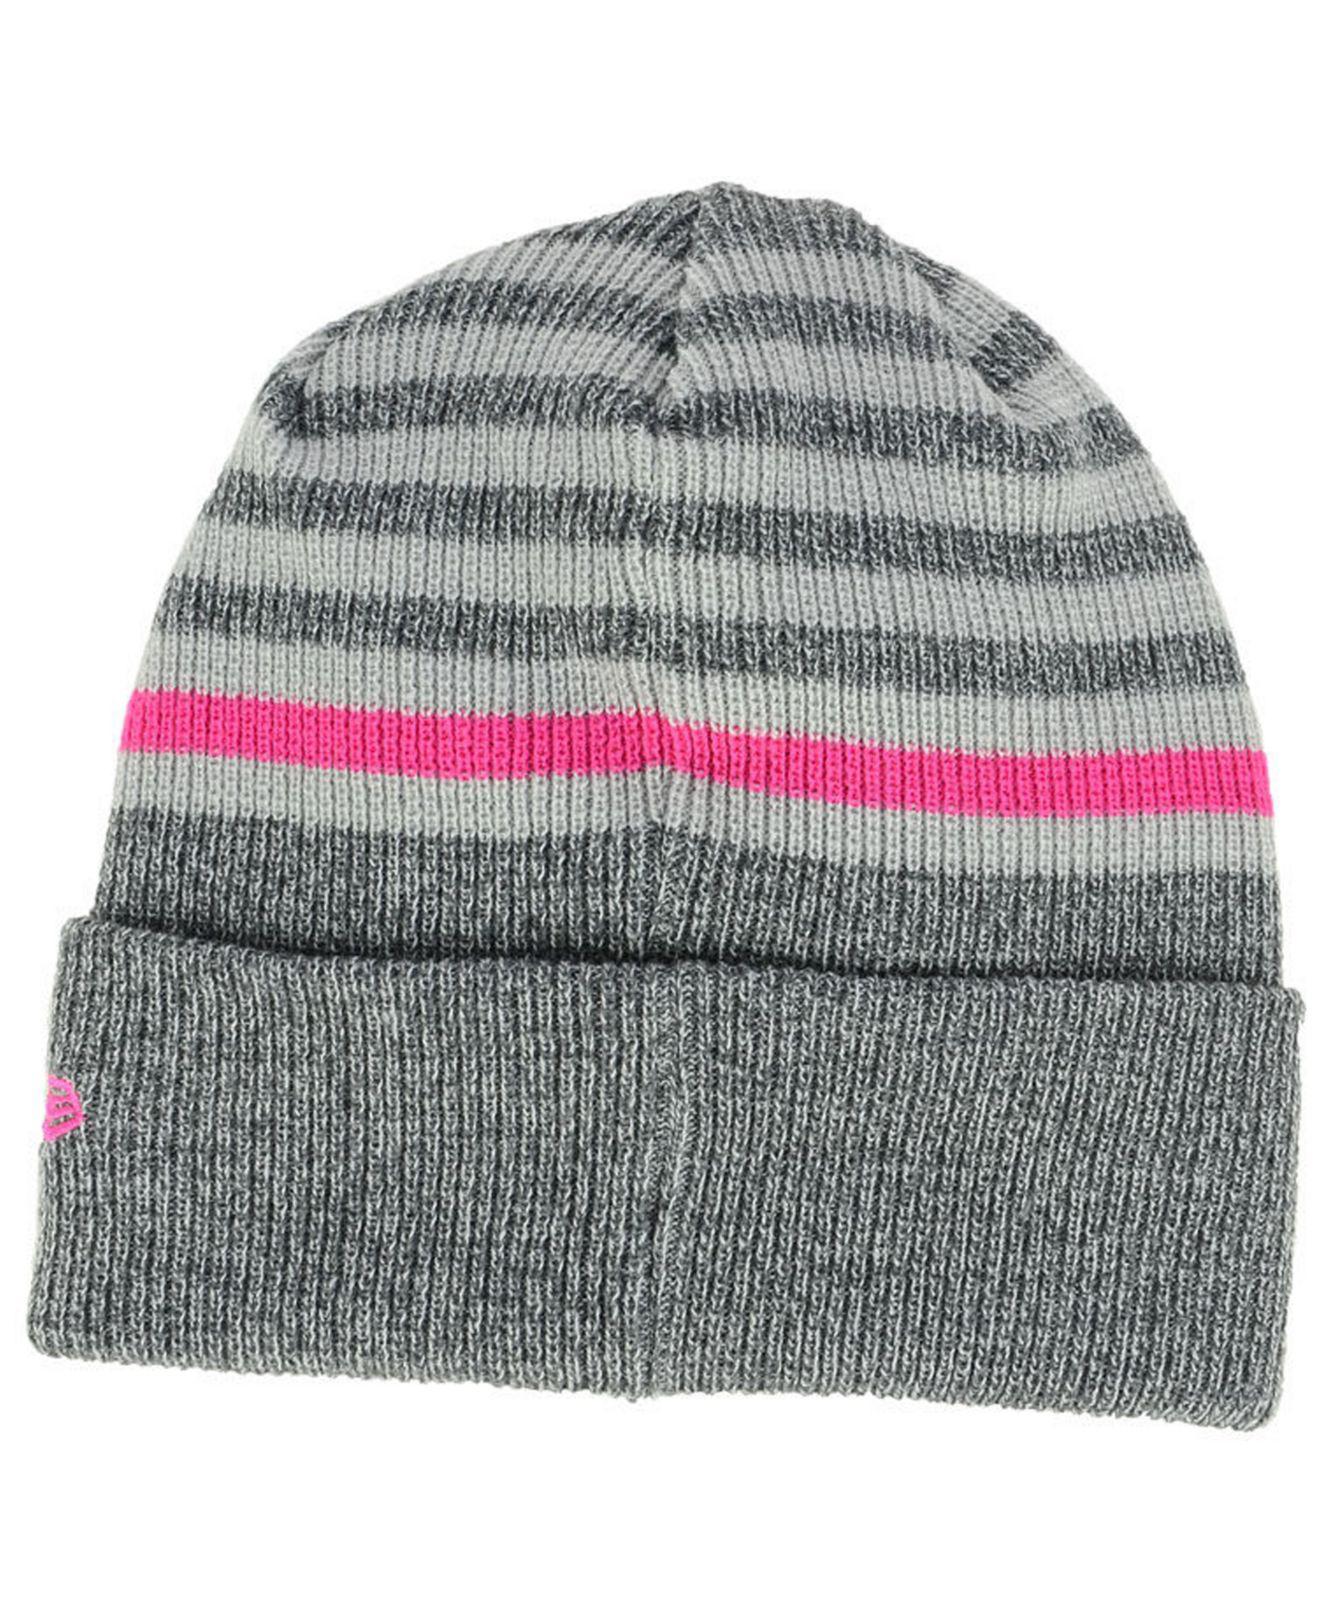 b5fb9d40f81f51 canada lyst ktz indiana pacers striped cuff knit hat in gray for men 88036  ec5dc